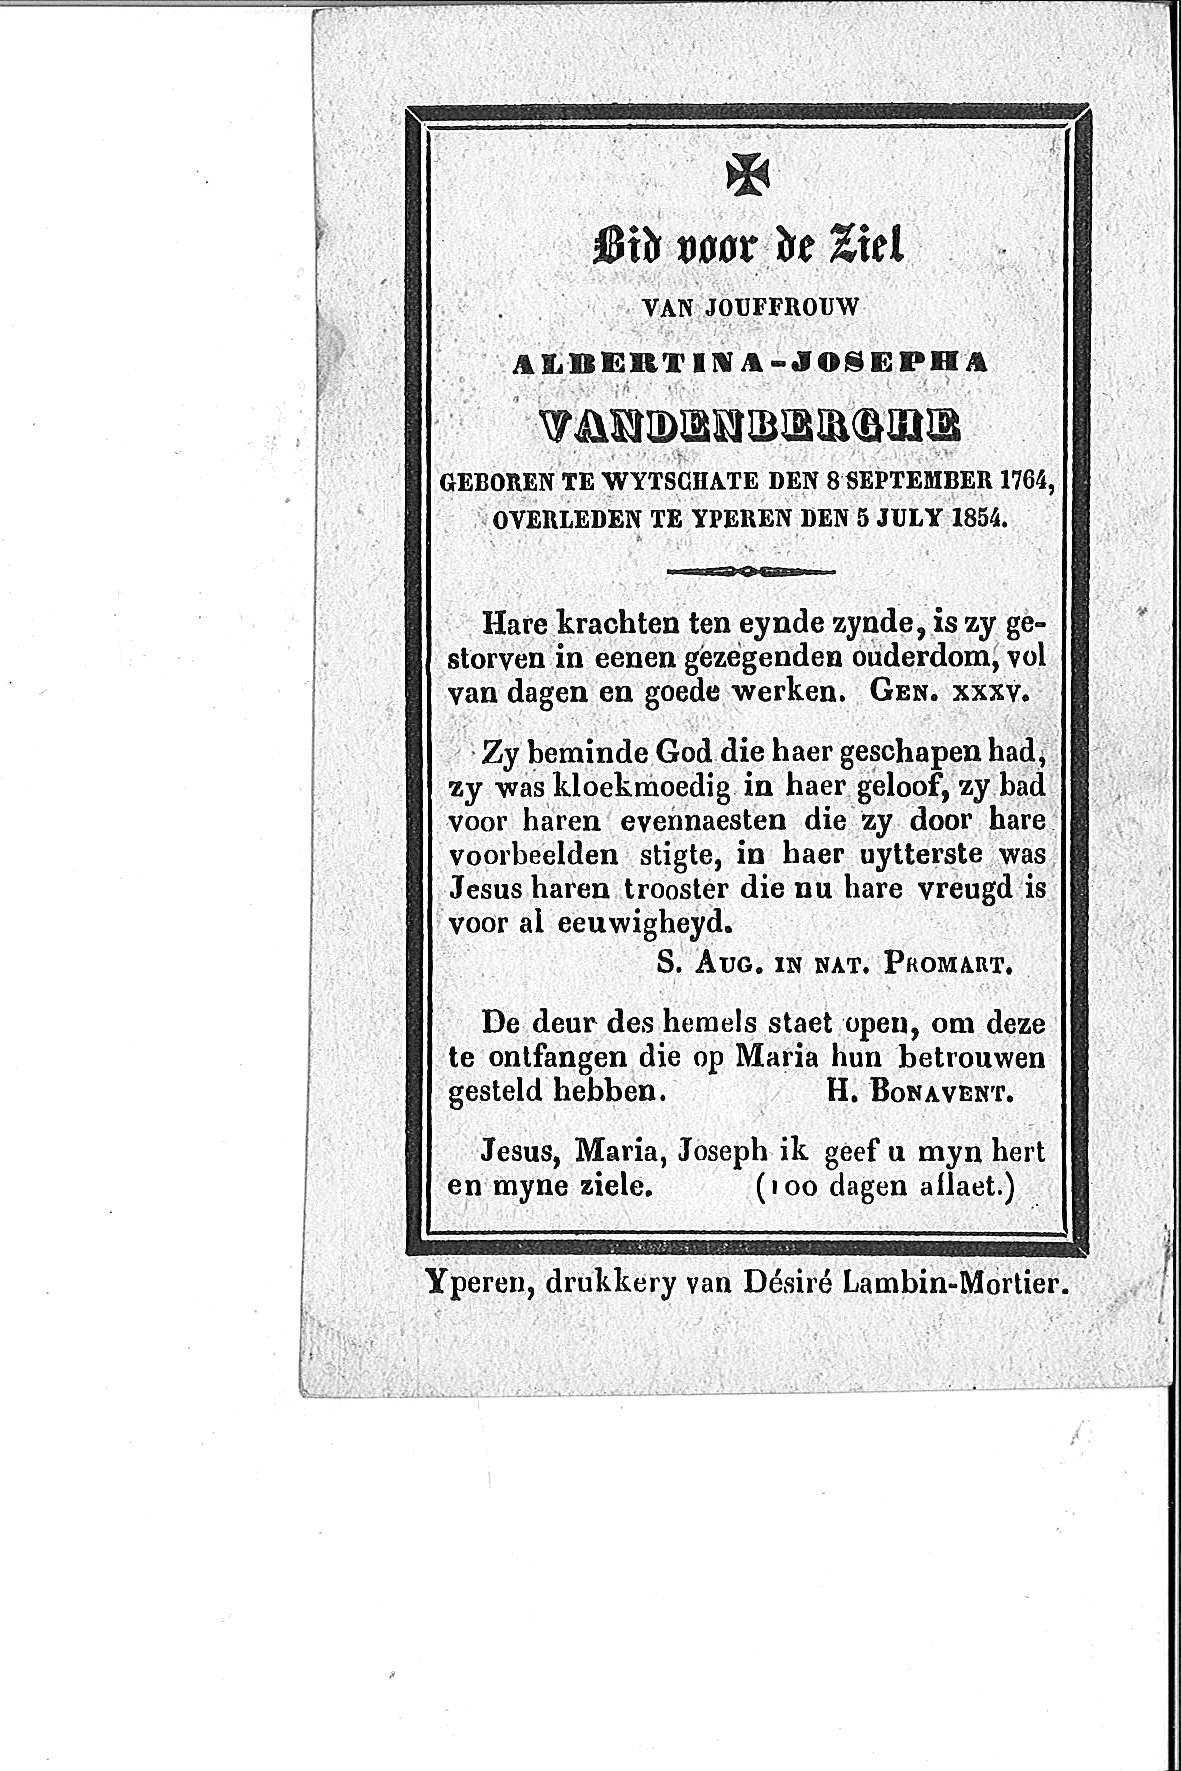 Albertina_Josepha(1854)20150730131418_00005.jpg